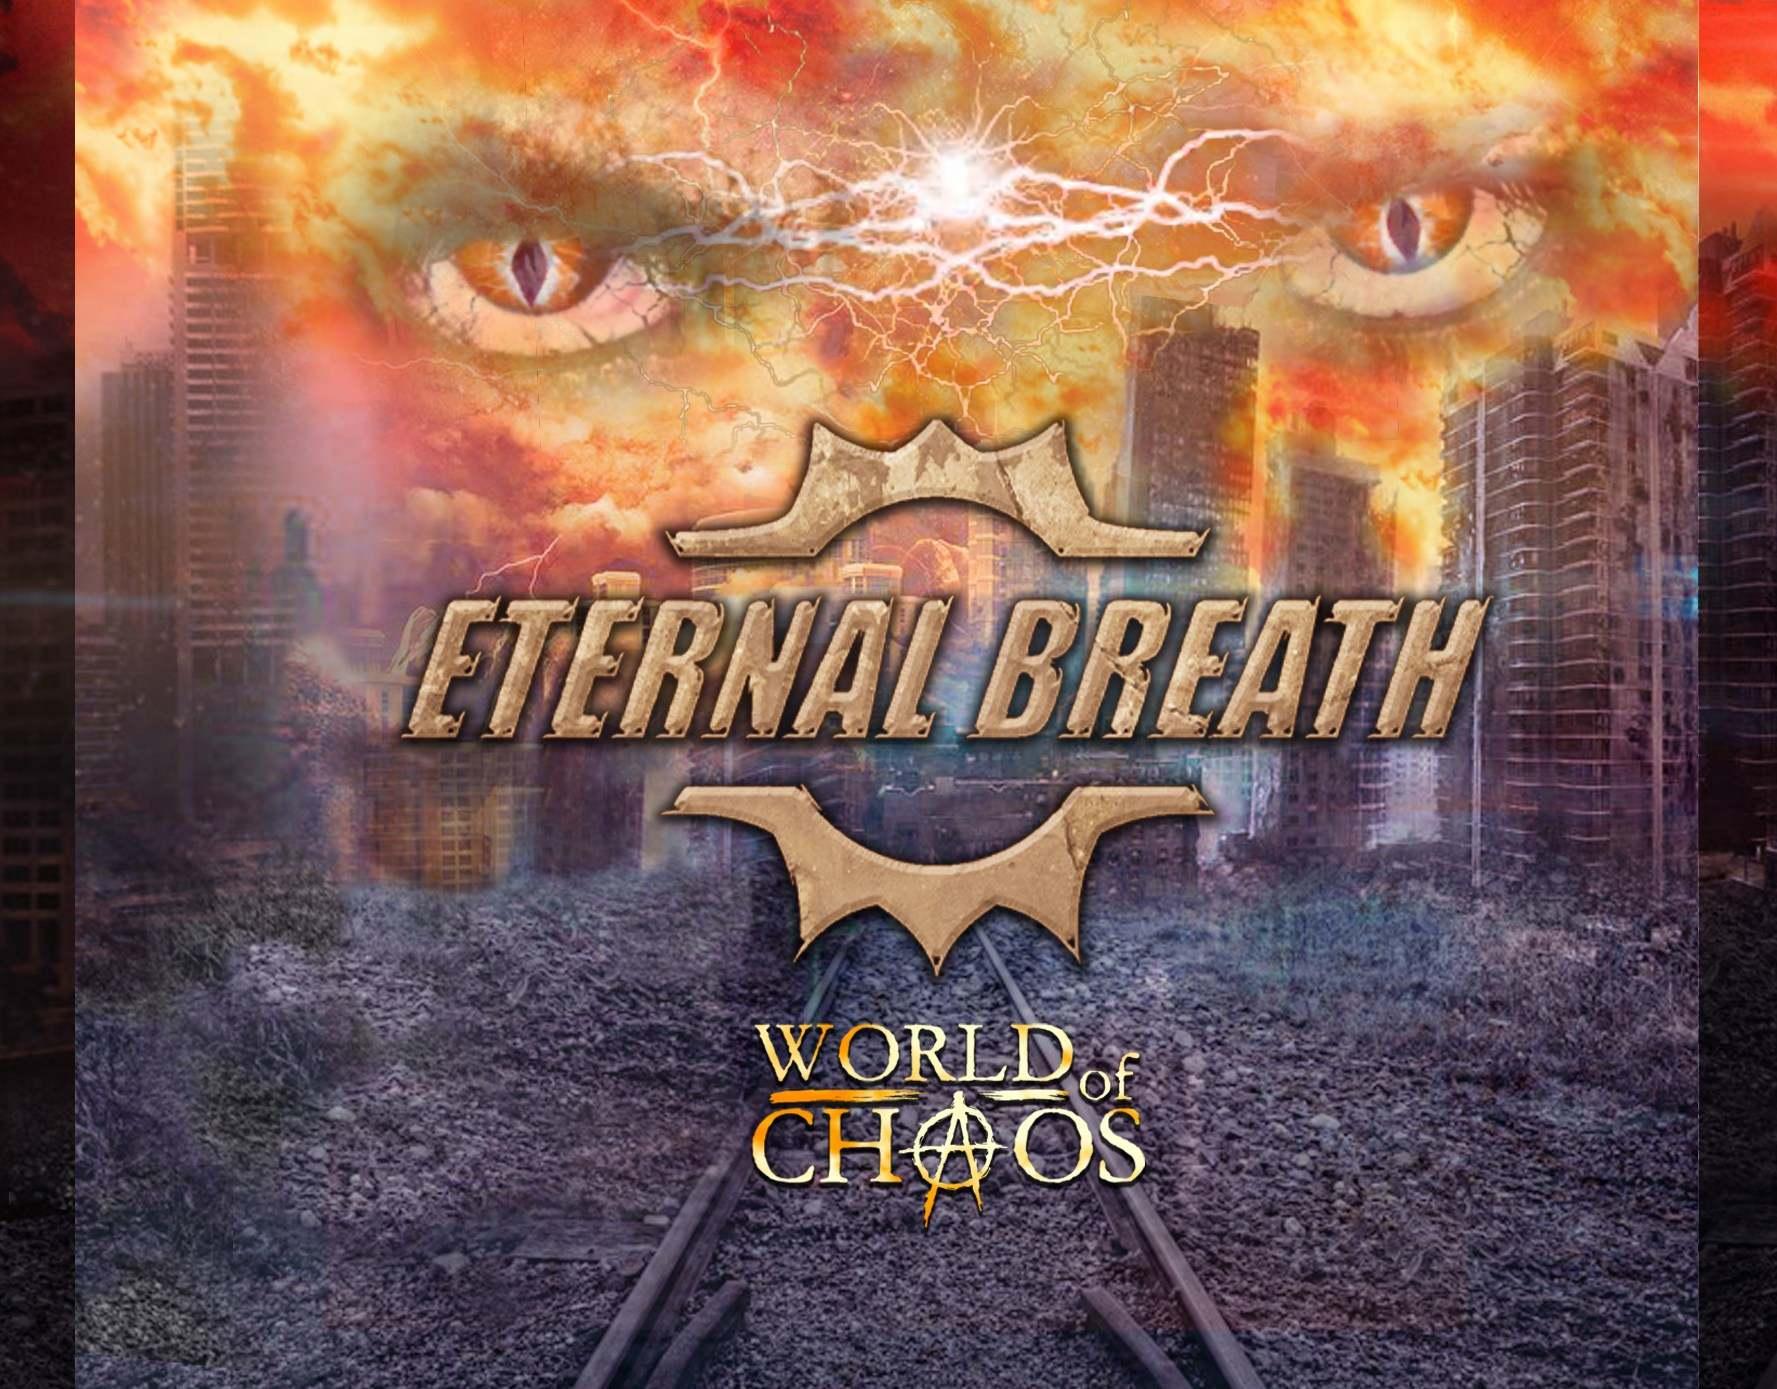 eternal breath world in chaos album cover